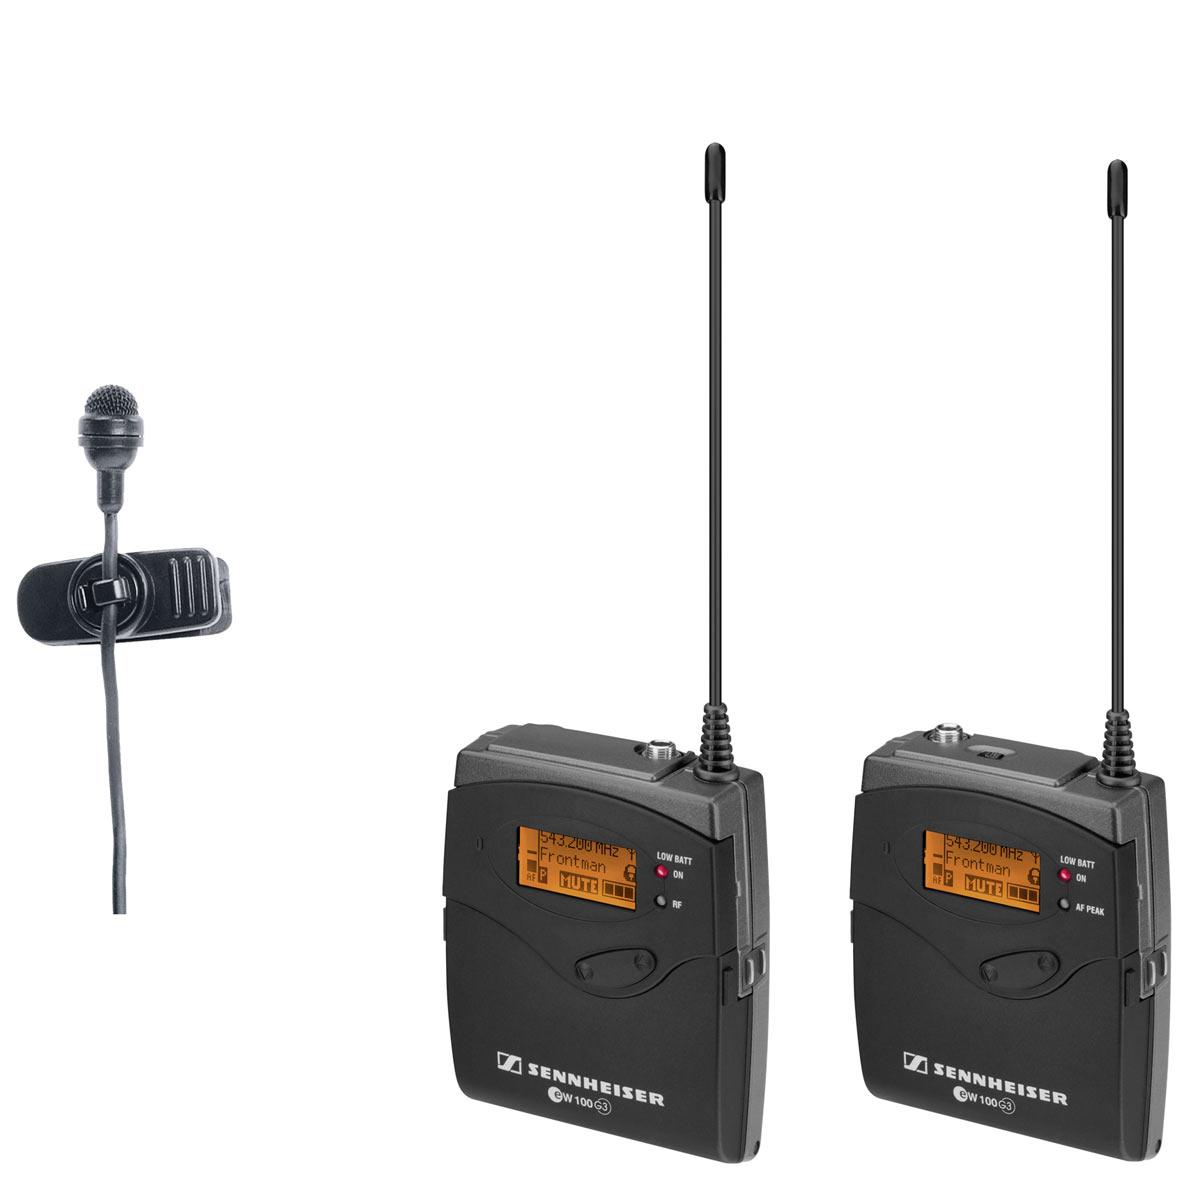 Kit Trasmettitore da tasca + microfono a clip ME4 + Ricevitore portatile G3 566-608MHz Range G